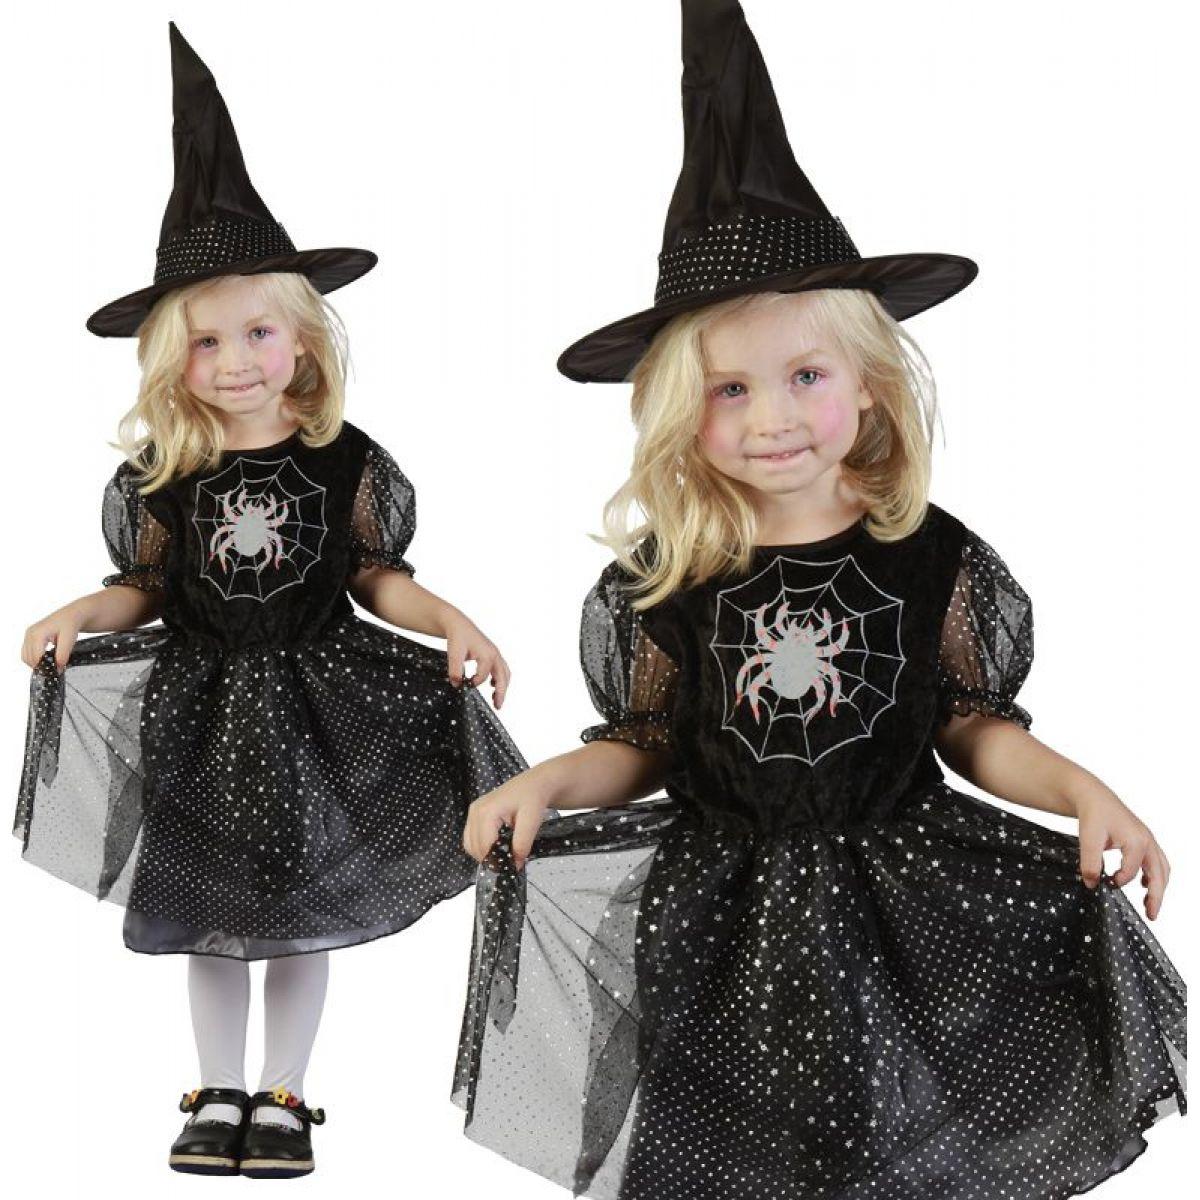 HM Studio Dětský kostým Čarodějka 92 - 104 cm